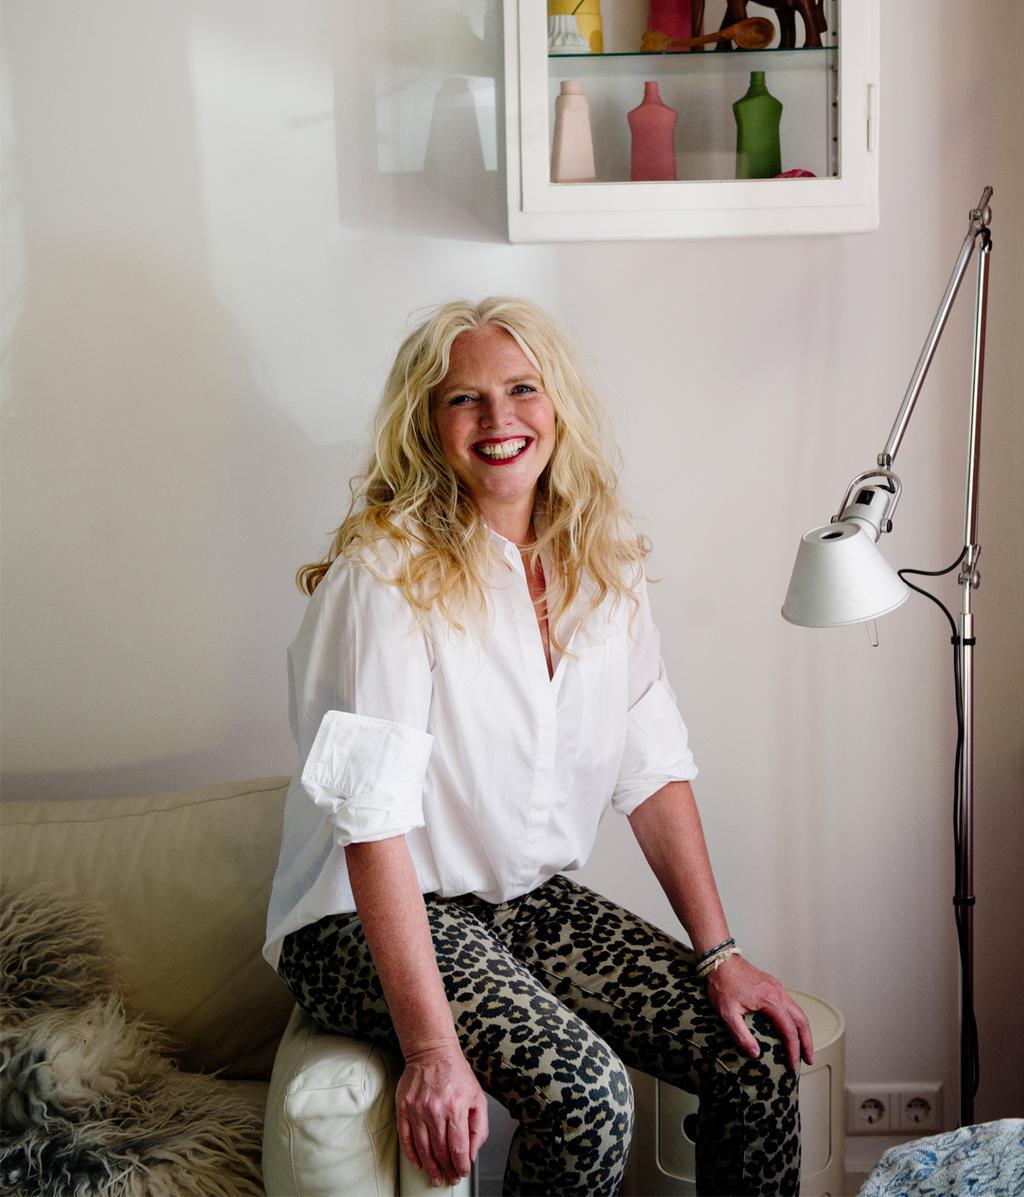 Nicolette Fox